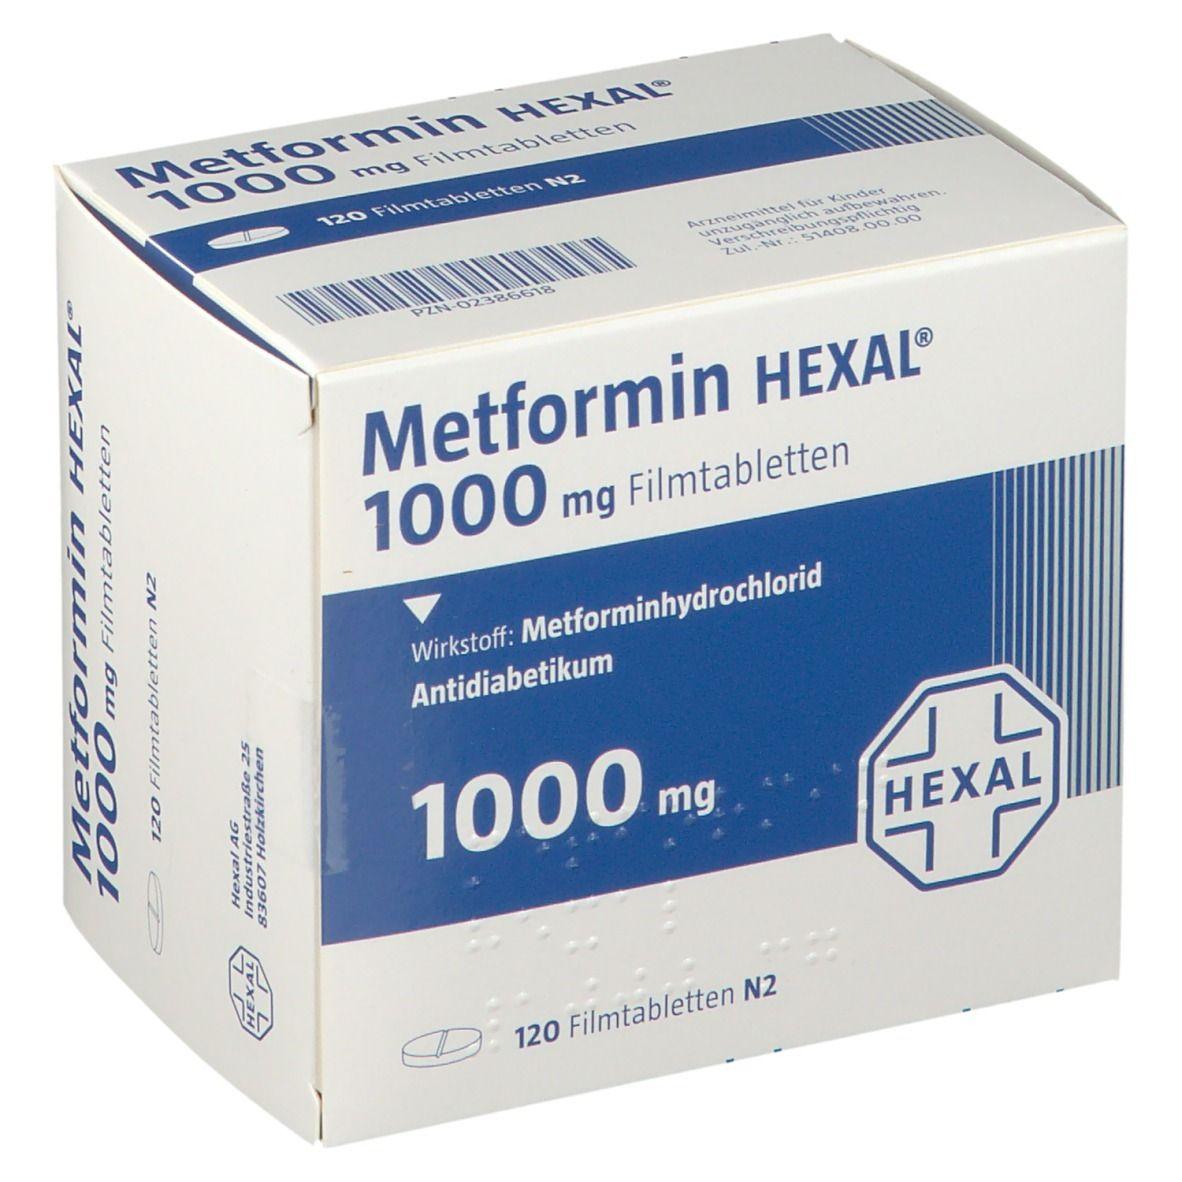 Metformin Hexal 1000 mg Filmtabletten 120 St - shop